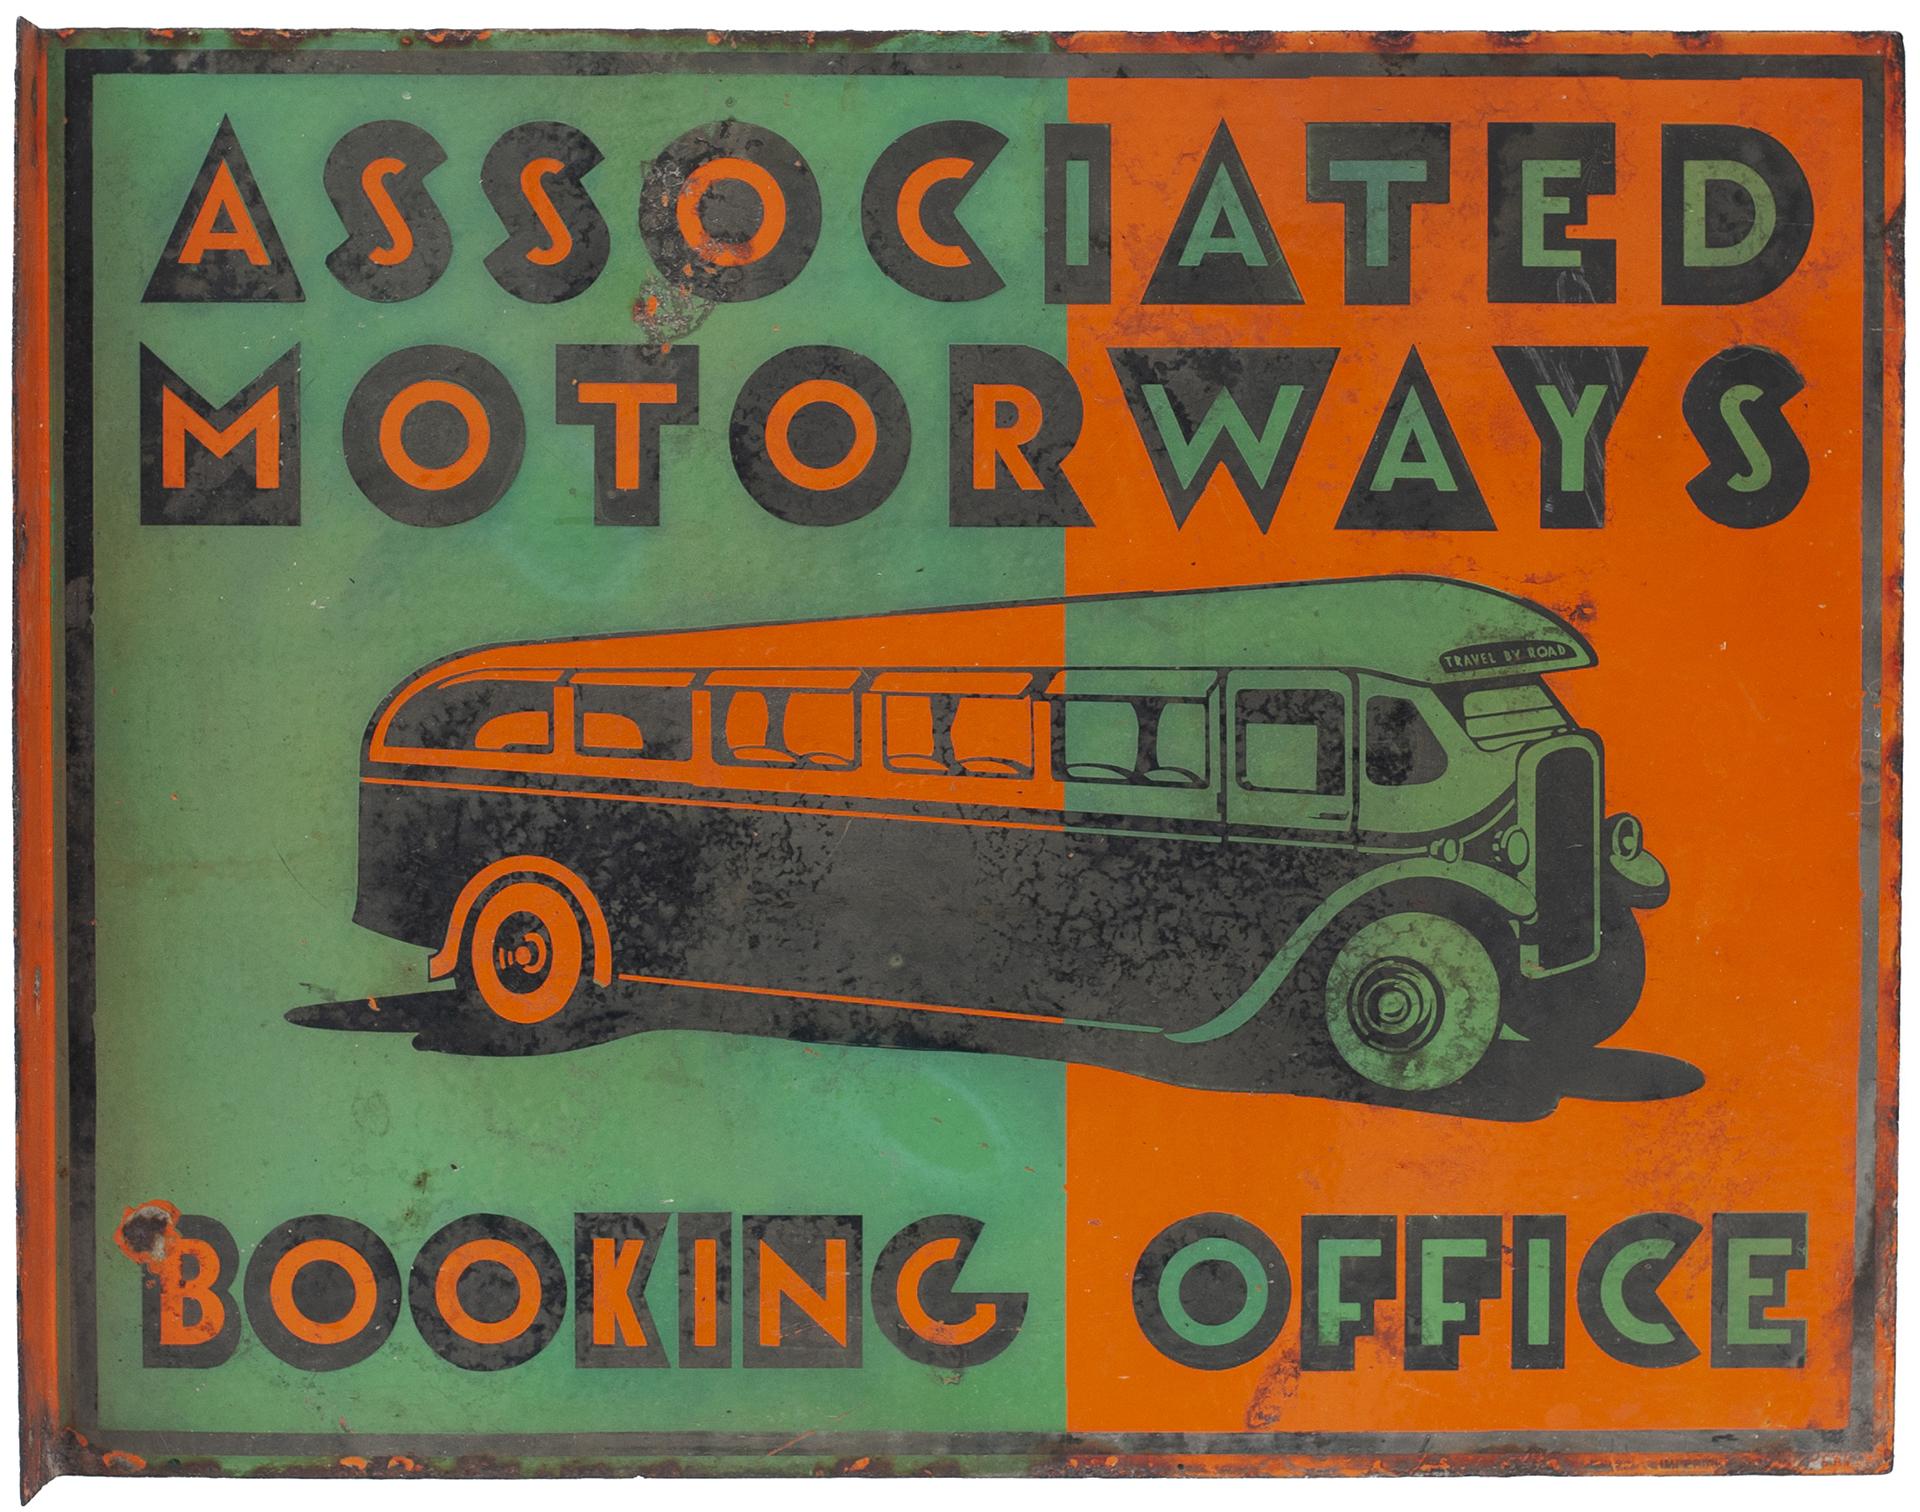 Bus Motoring Enamel Sign ASSOCIATED MOTORWAYS